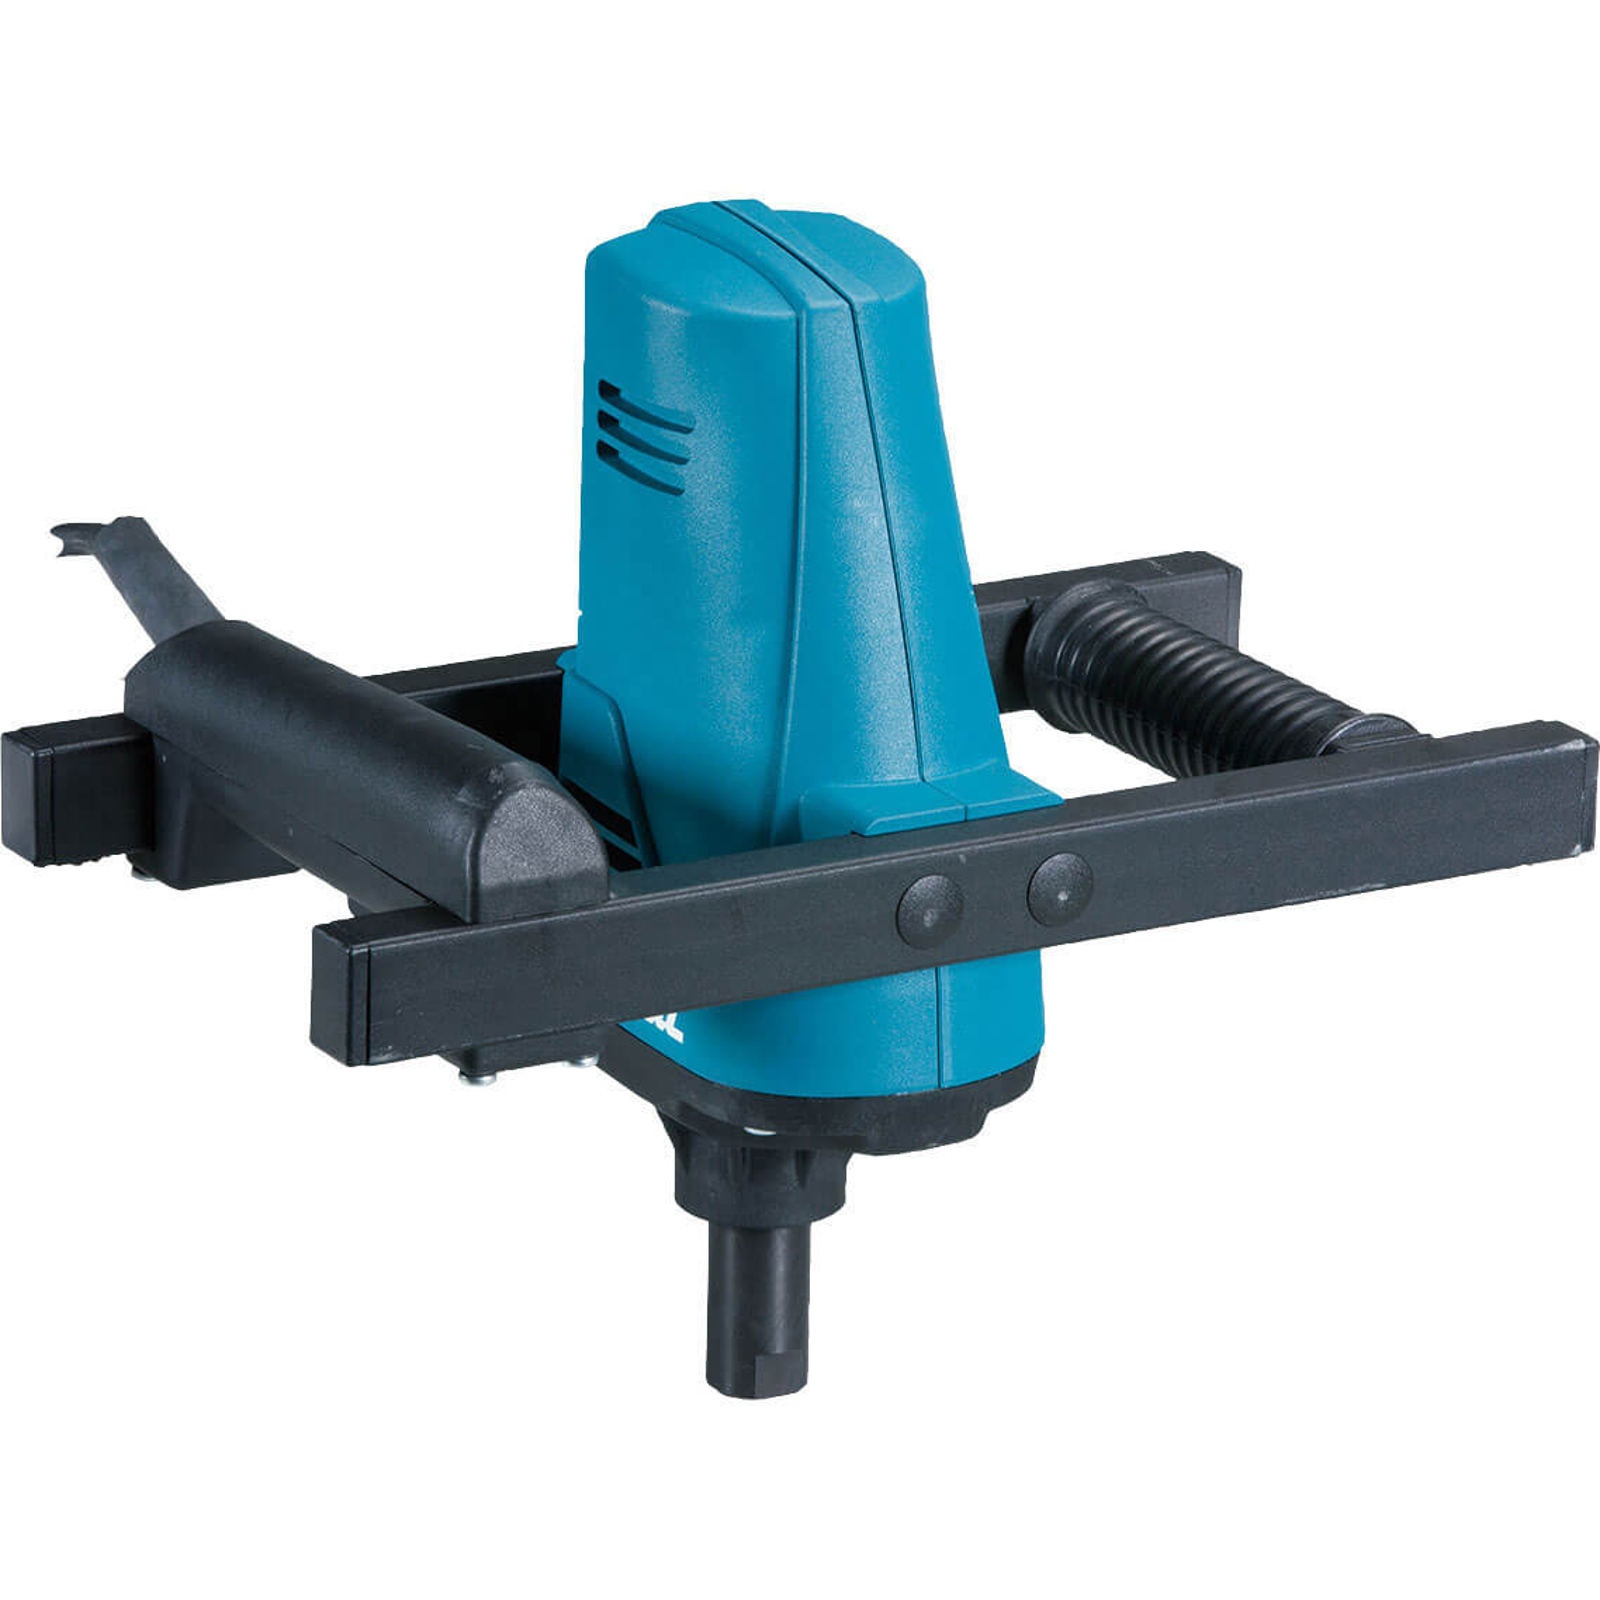 Makita UT1200 Electric Paddle Mixer 850w 110v